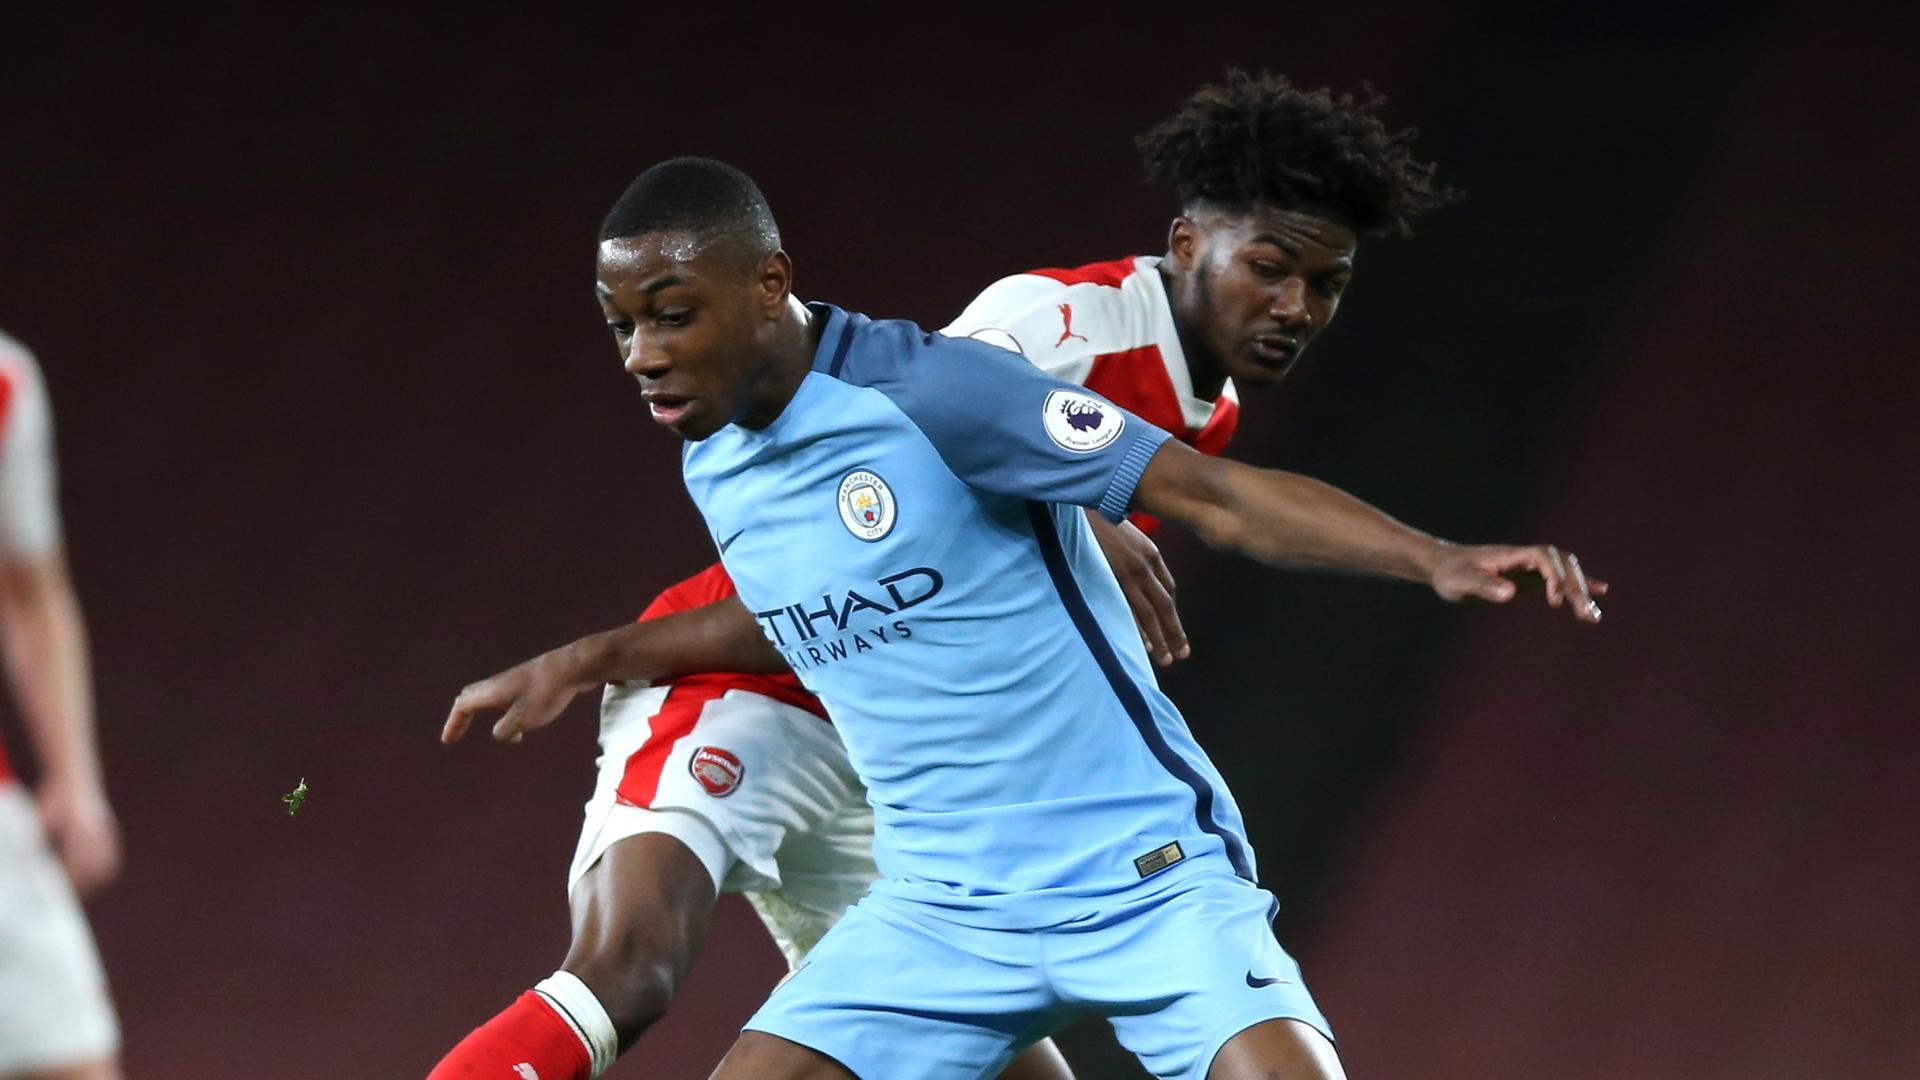 Denzeil Boadu Arsenal Manchester City 031317